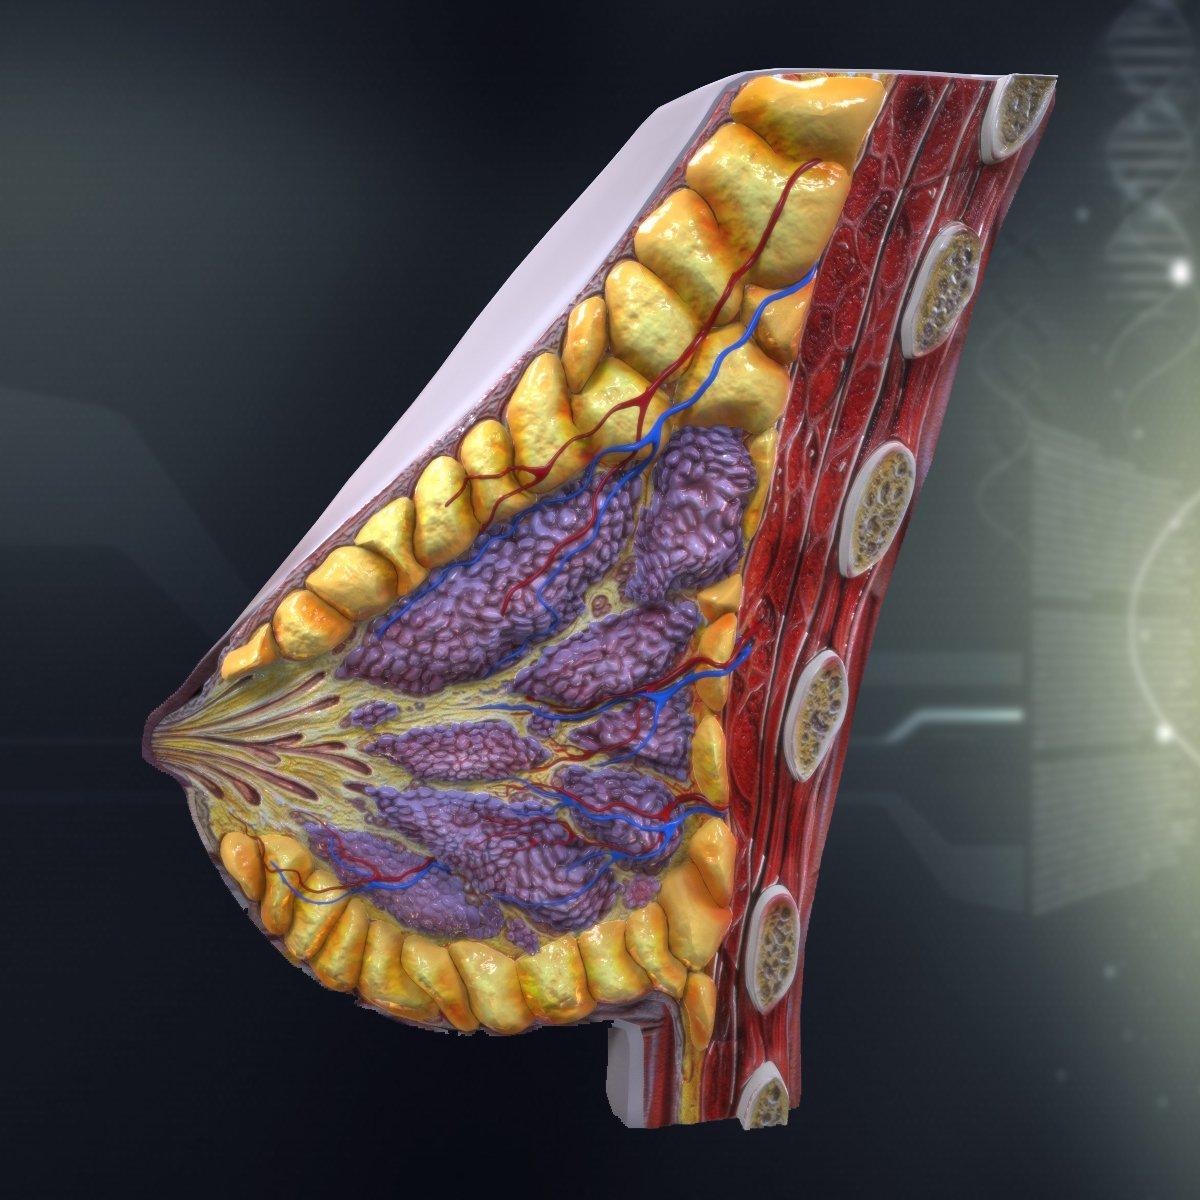 Human Female Breast Anatomy 3D Model in Anatomy 3DExport